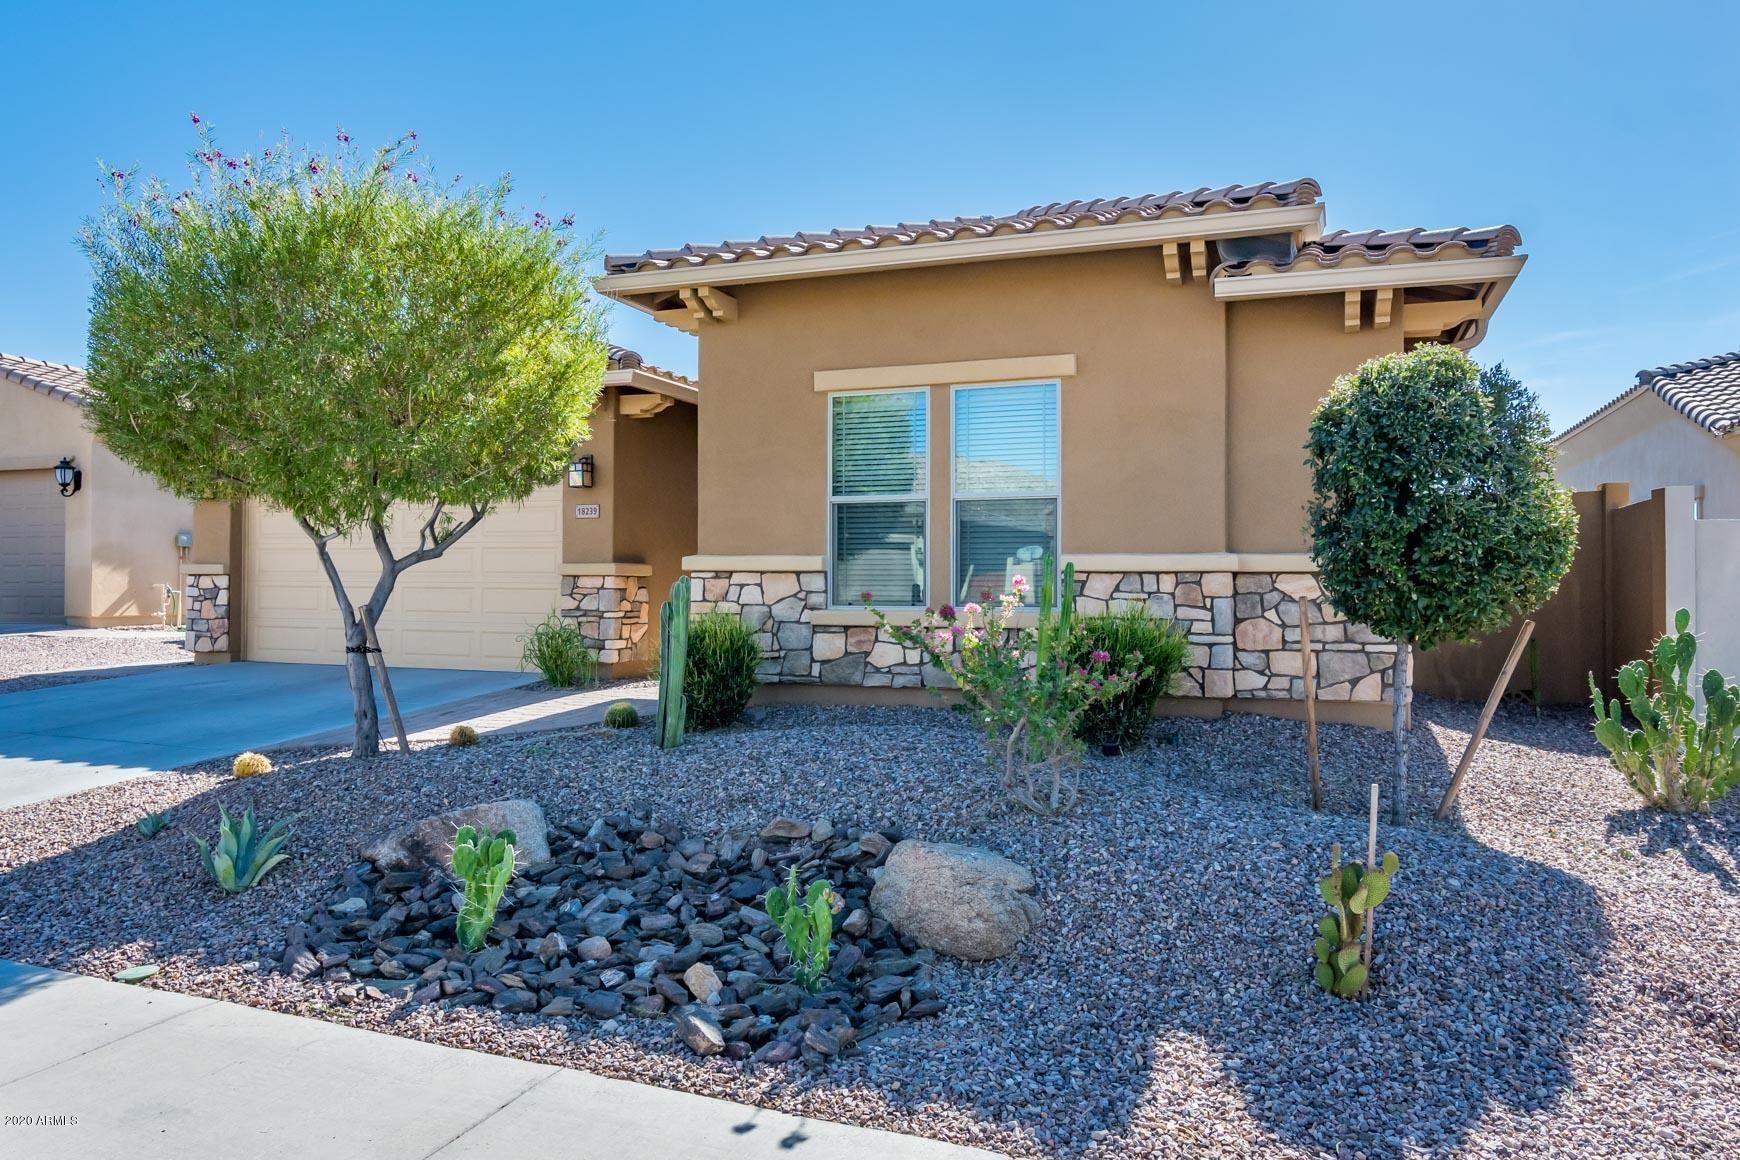 Photo of 18239 W DESERT SAGE Drive, Goodyear, AZ 85338 (MLS # 6199408)